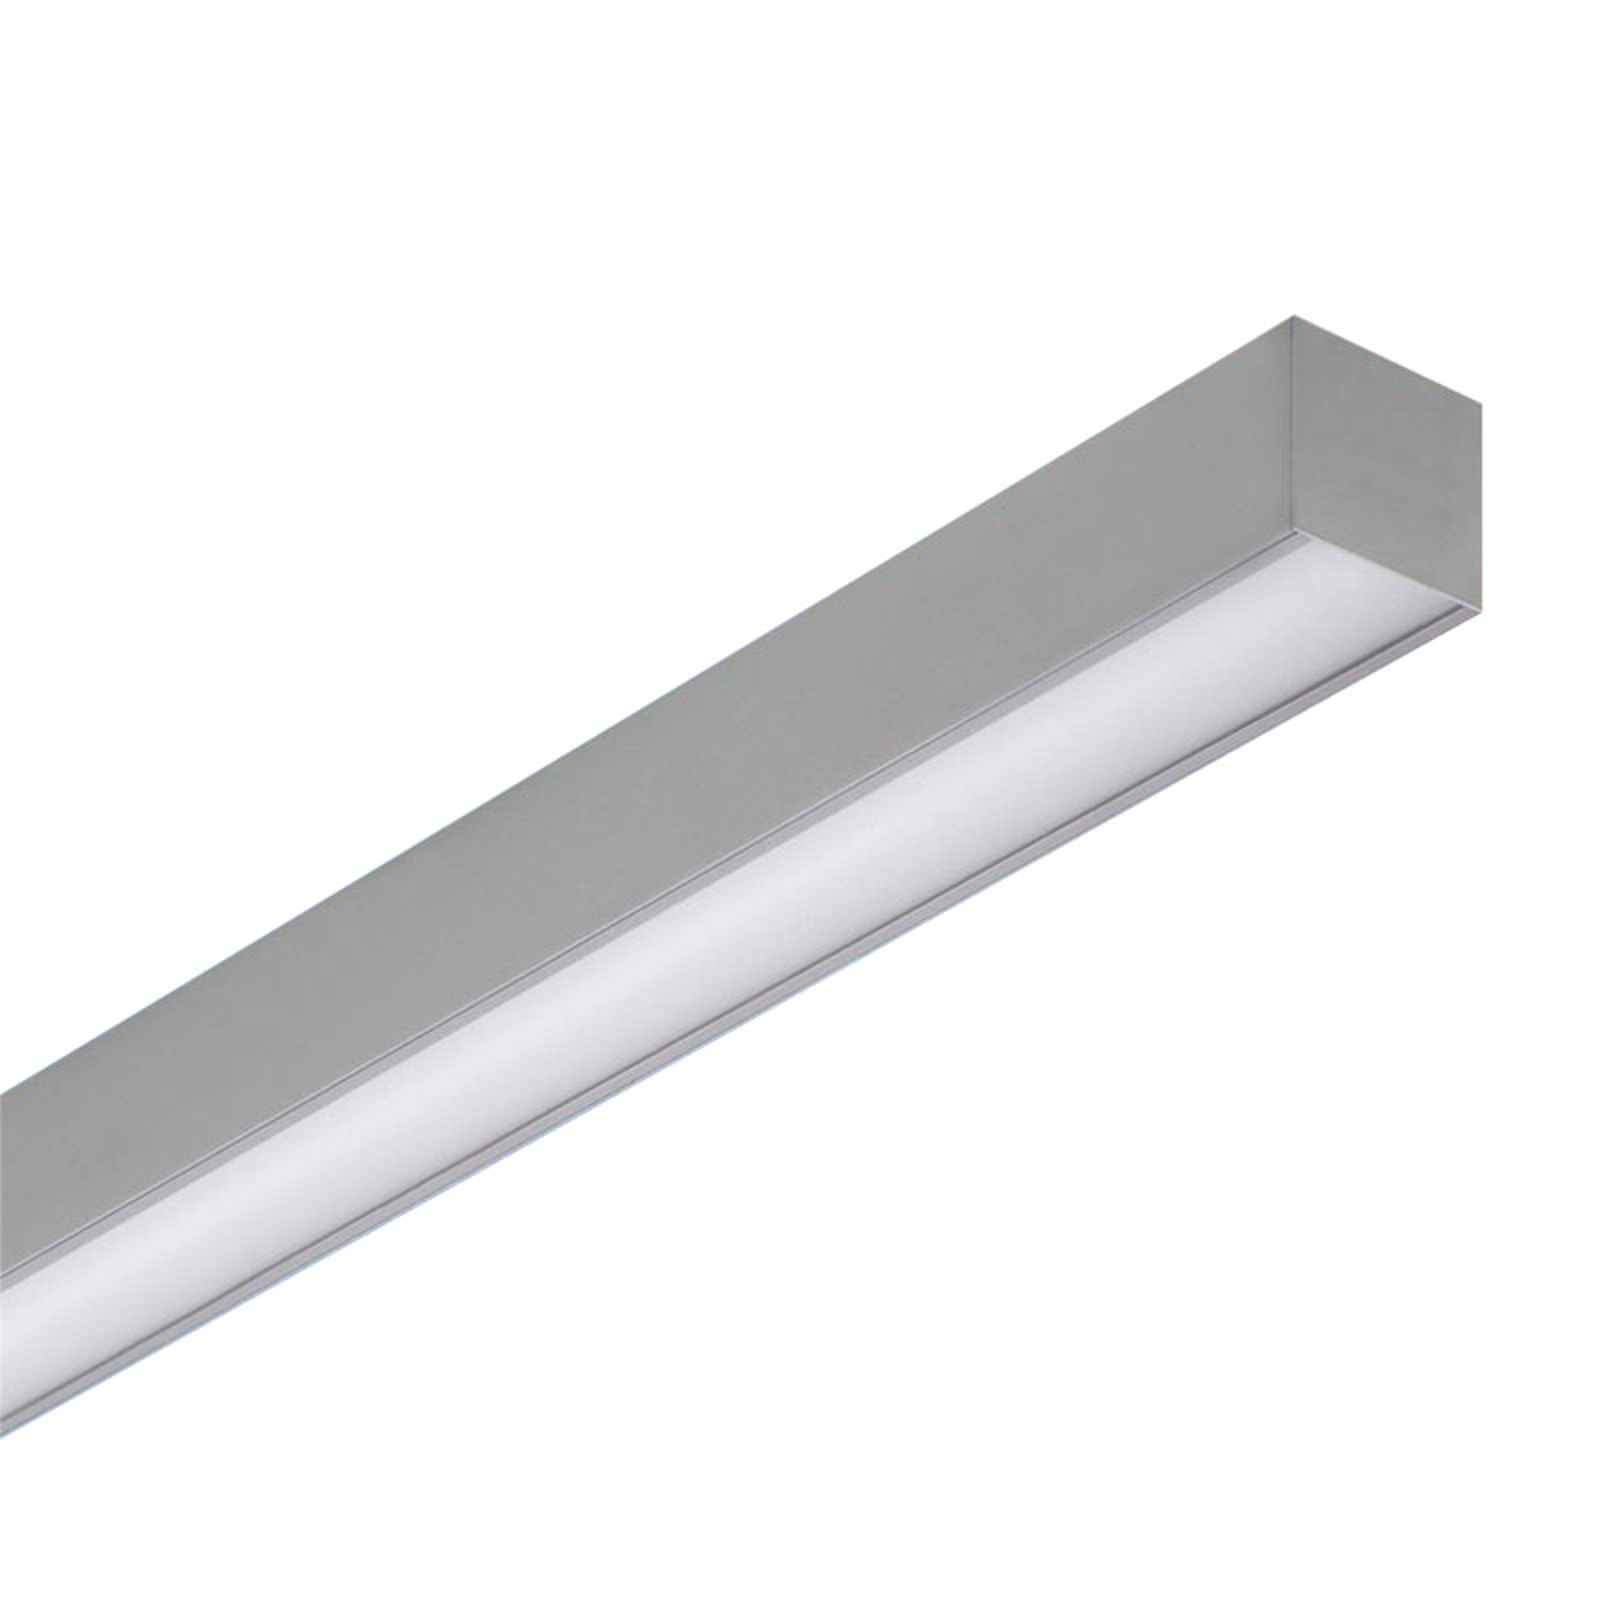 Efficiënte LED wandlamp LKPW075, 4.000K